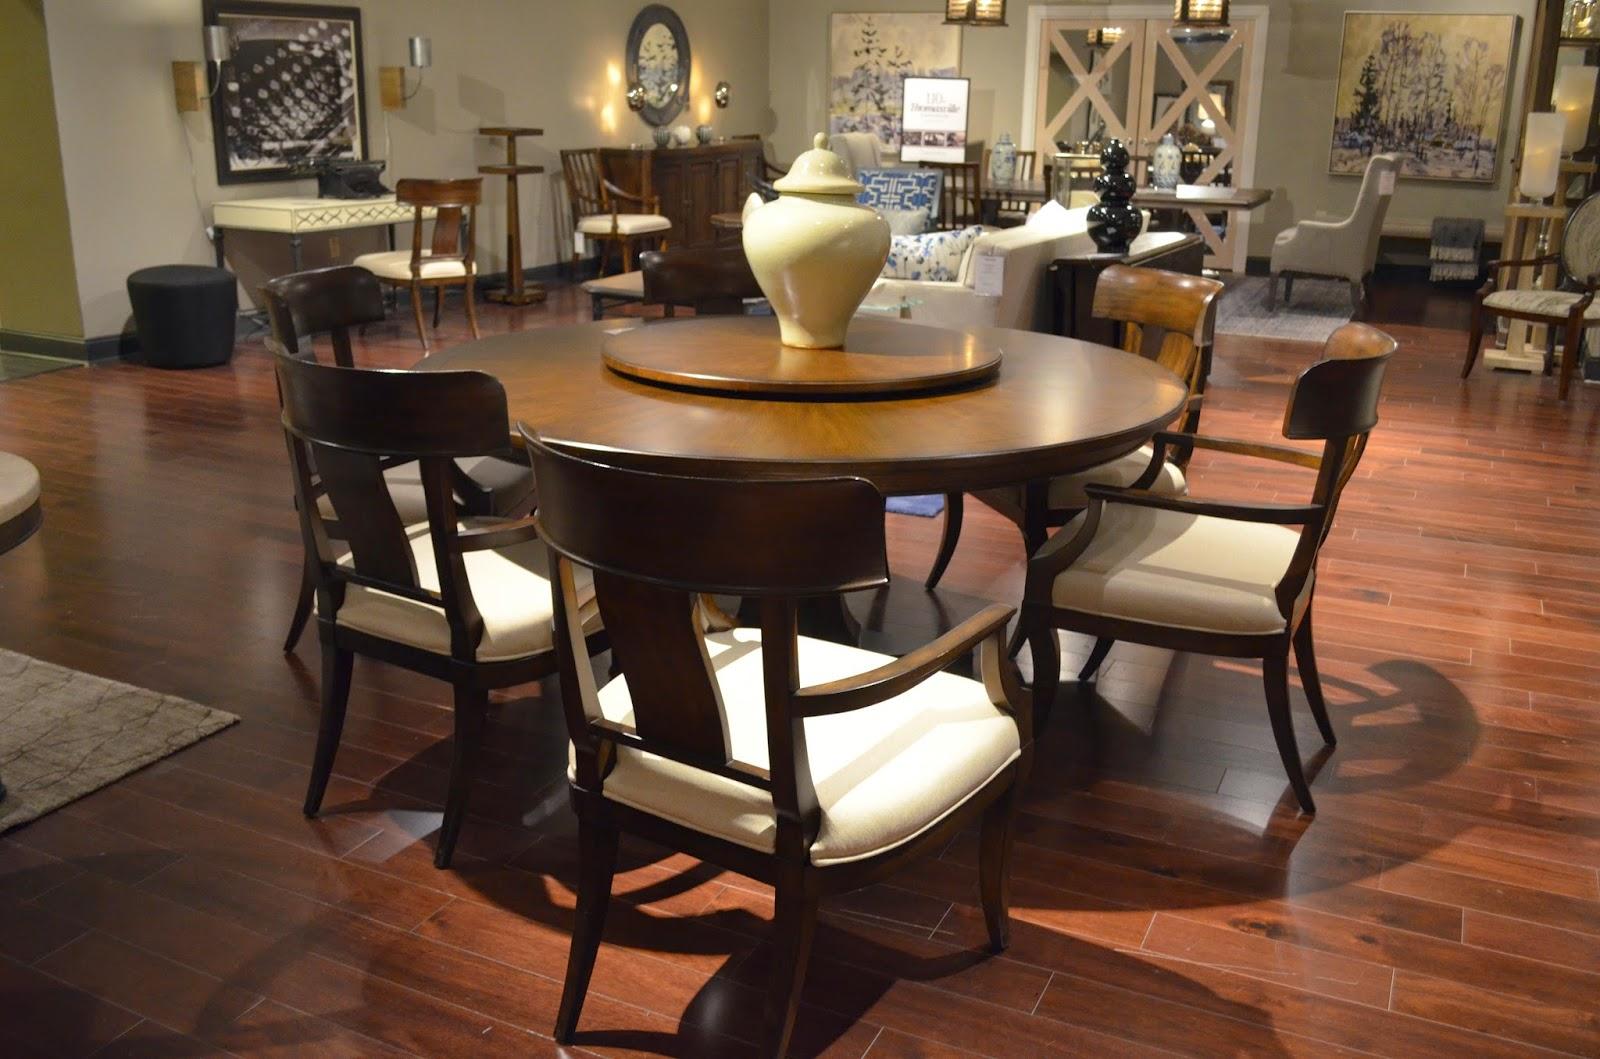 lisa mende design thomasville furniture at high point market thomasville furniture at high point market